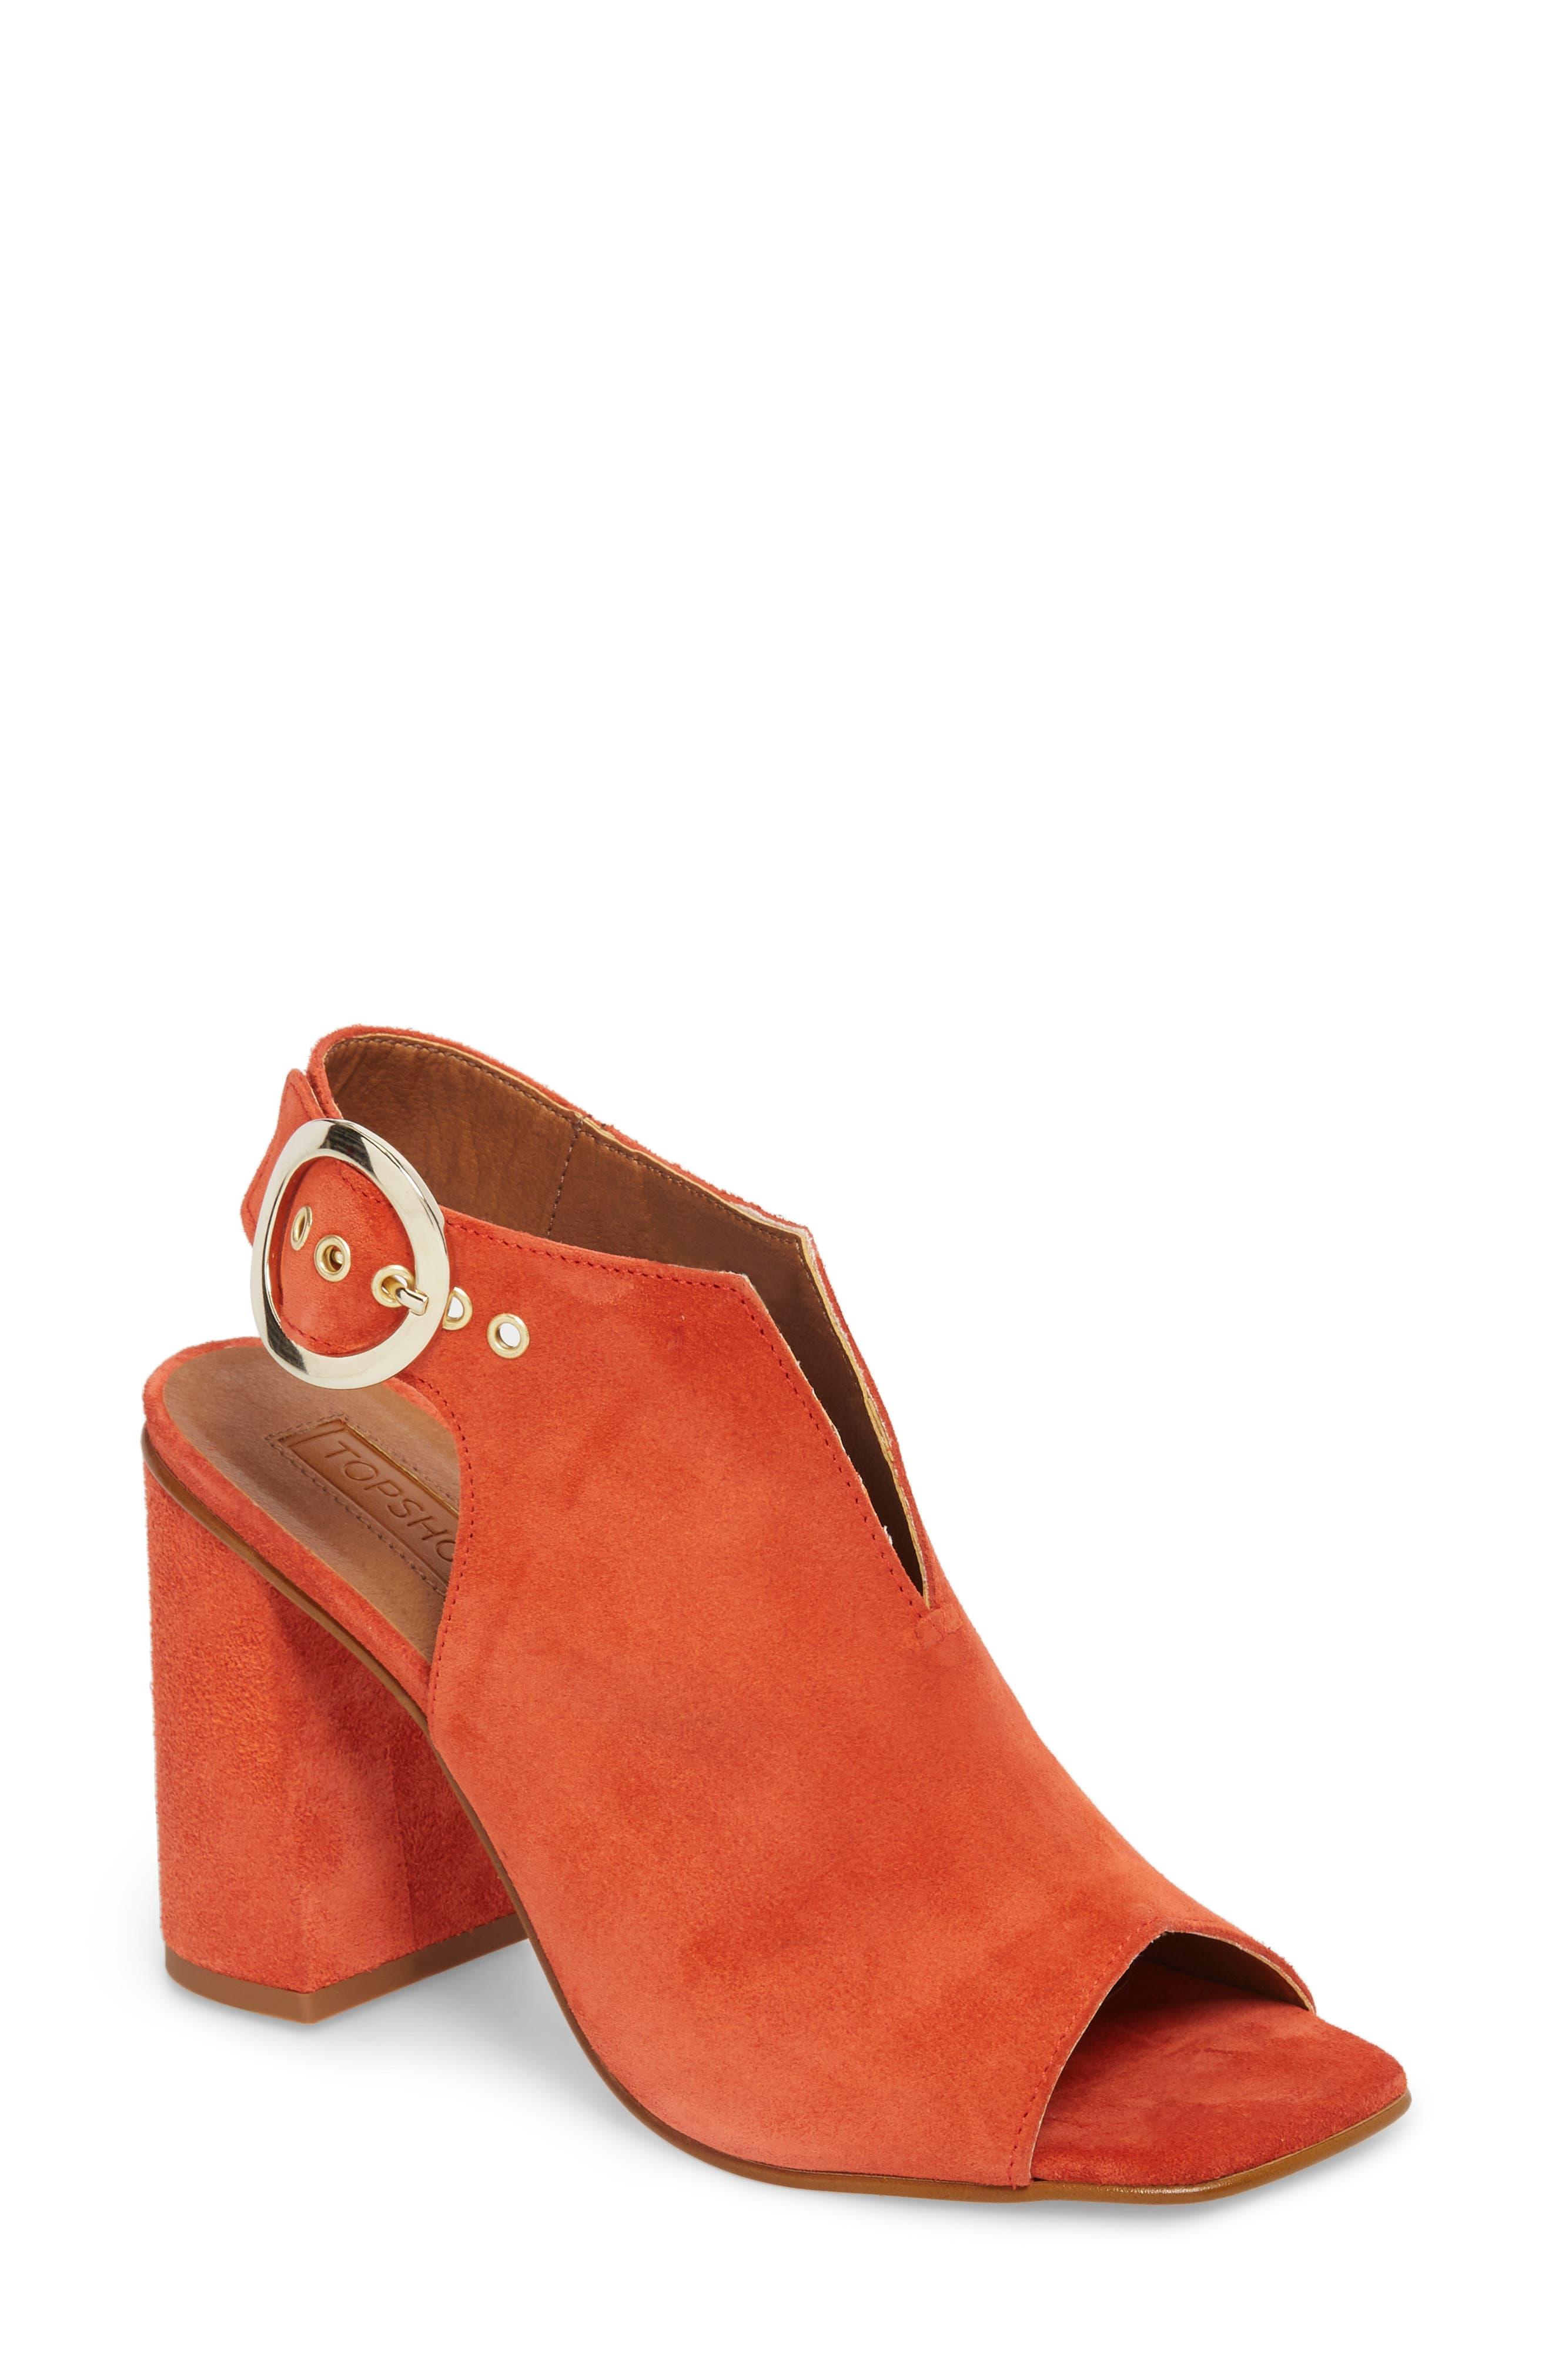 Nika Flared Heel Slingback Sandal,                             Main thumbnail 1, color,                             Orange